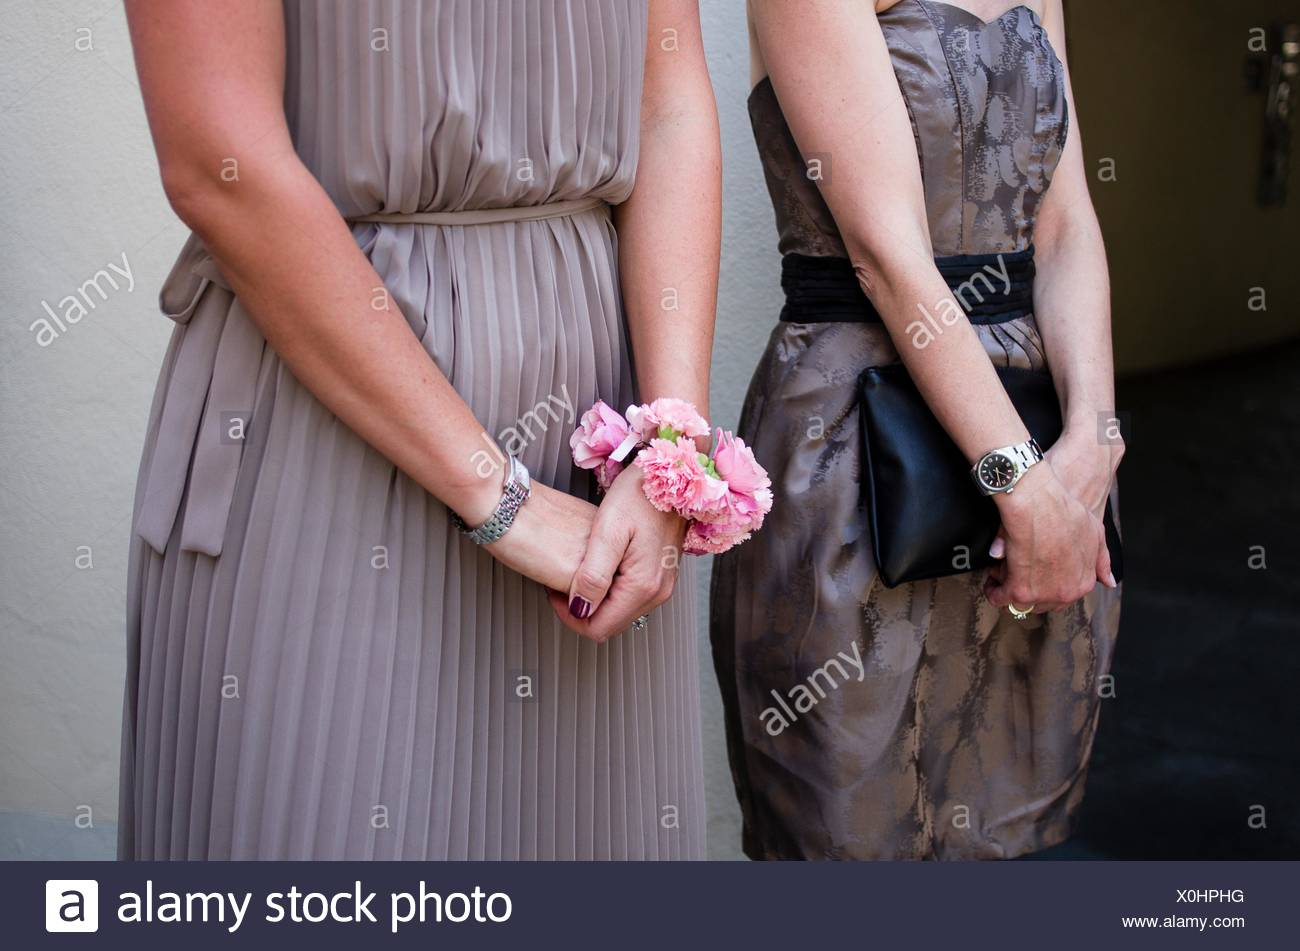 d81e4a7cde bridesmaid with flower bracelet Stock Photo: 275756812 - Alamy